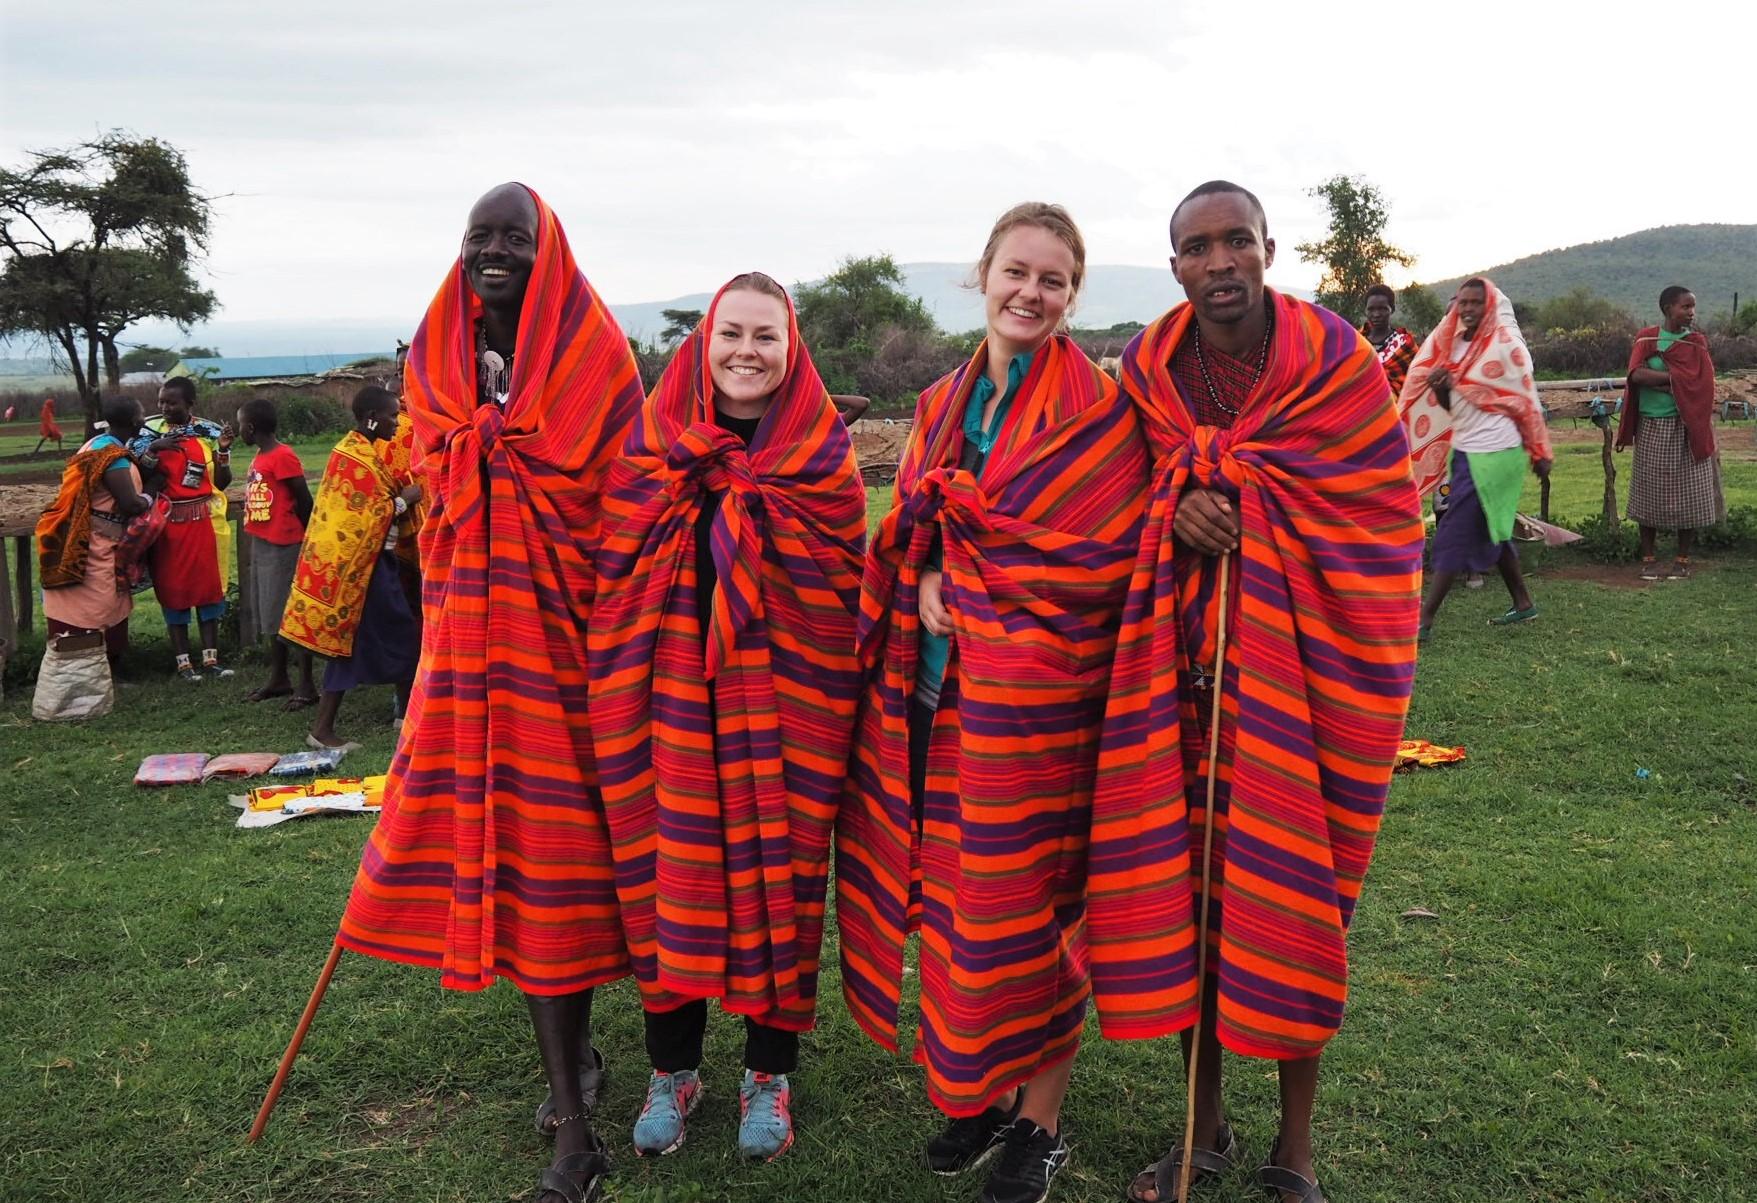 Line (Aurora's friend) and Aurora were happy with their new Maasai clothing.